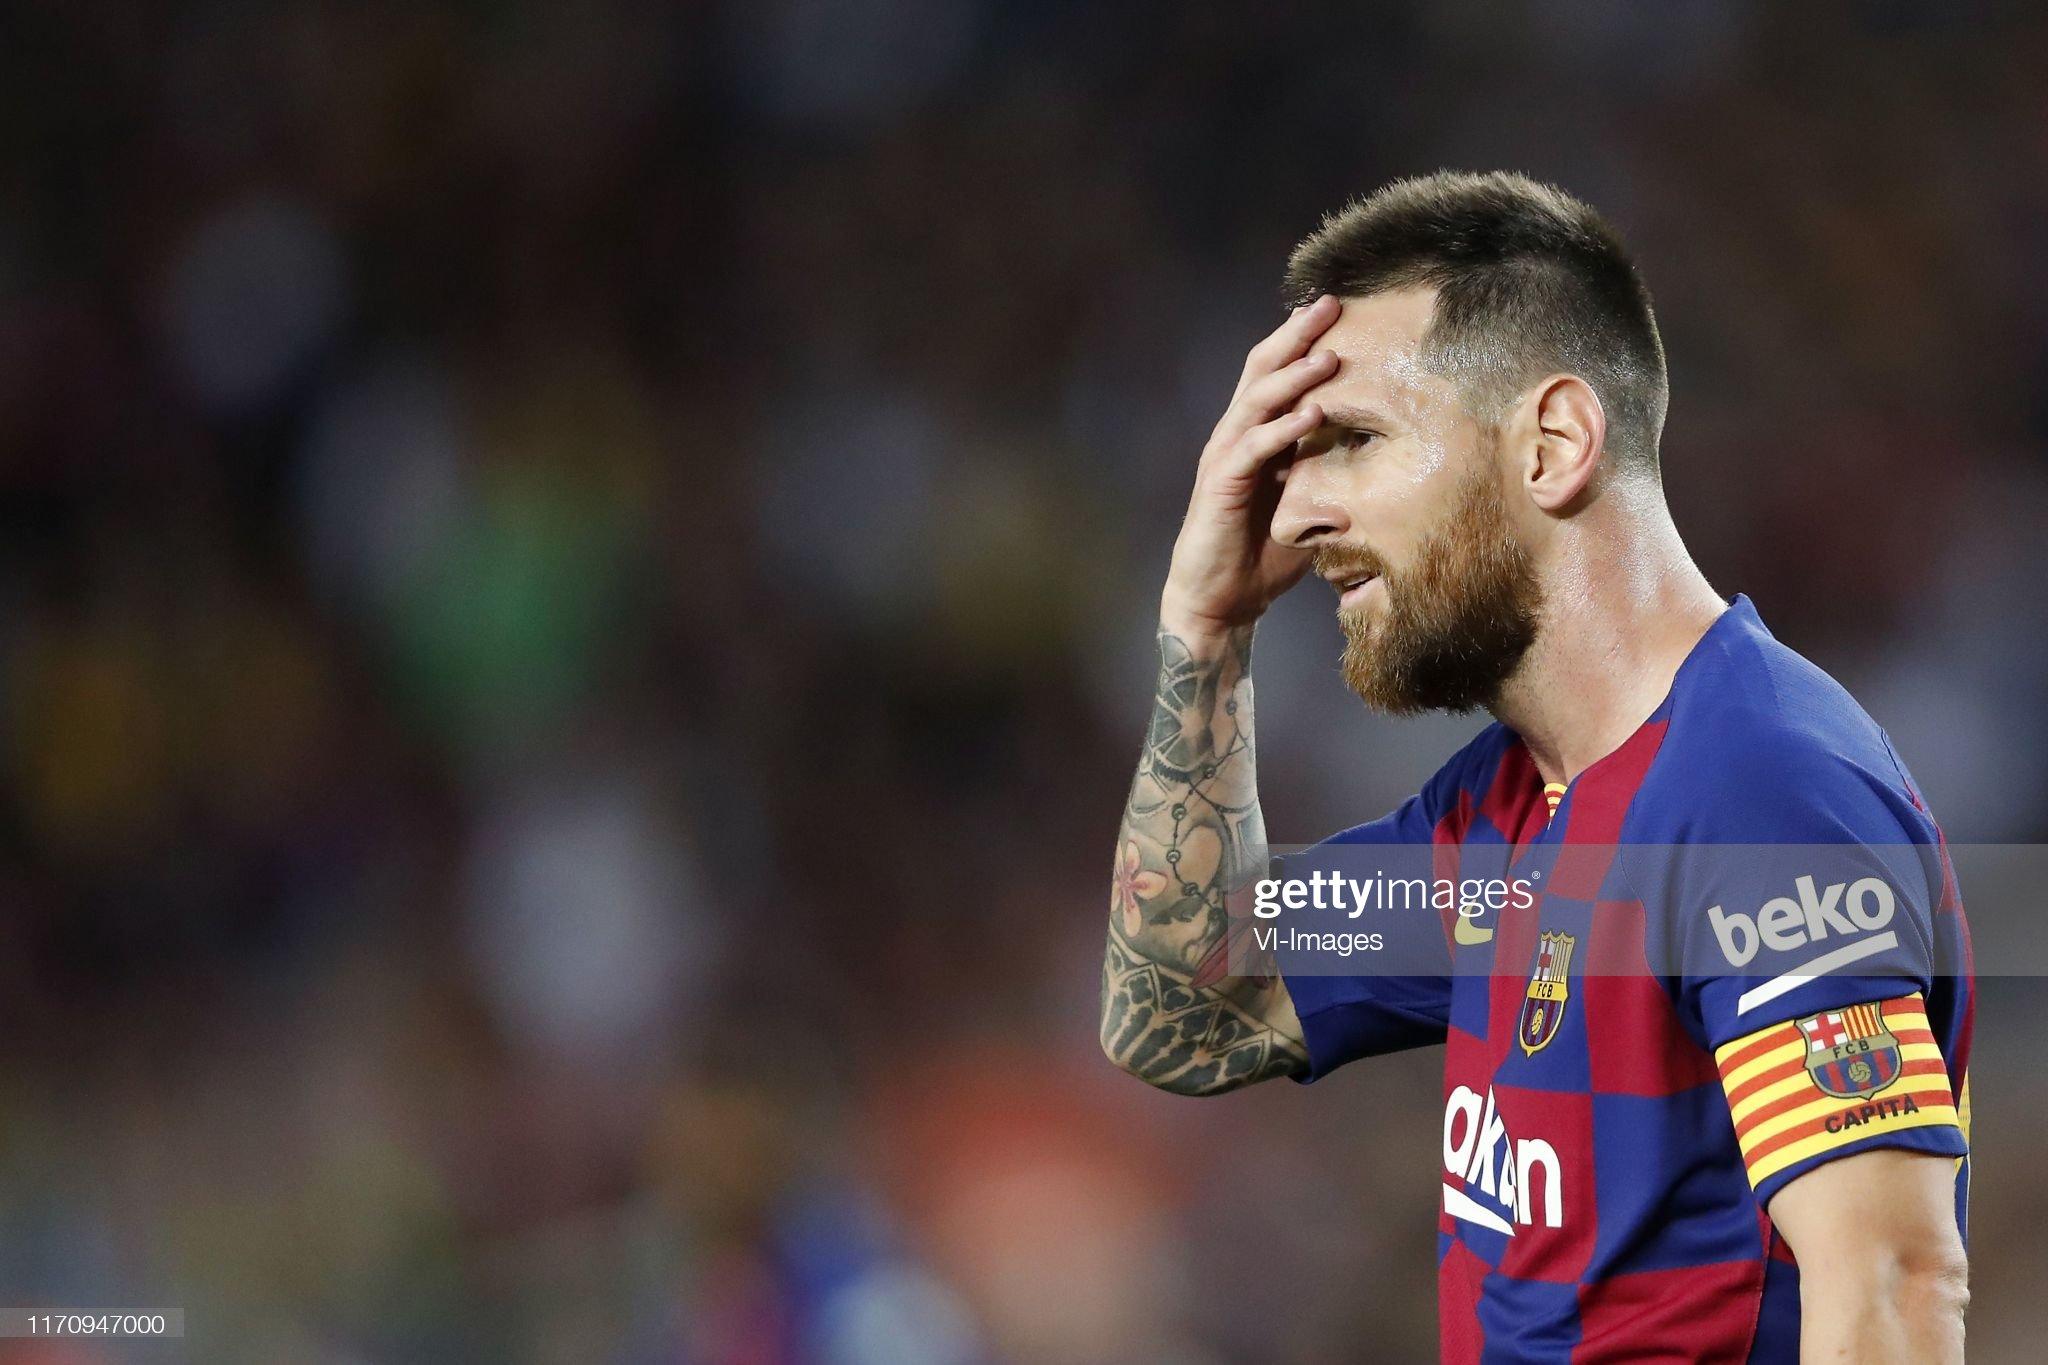 صور مباراة : برشلونة - فياريال 2-1 ( 24-09-2019 )  Lionel-messi-of-fc-barcelona-during-the-laliga-santander-match-fc-picture-id1170947000?s=2048x2048